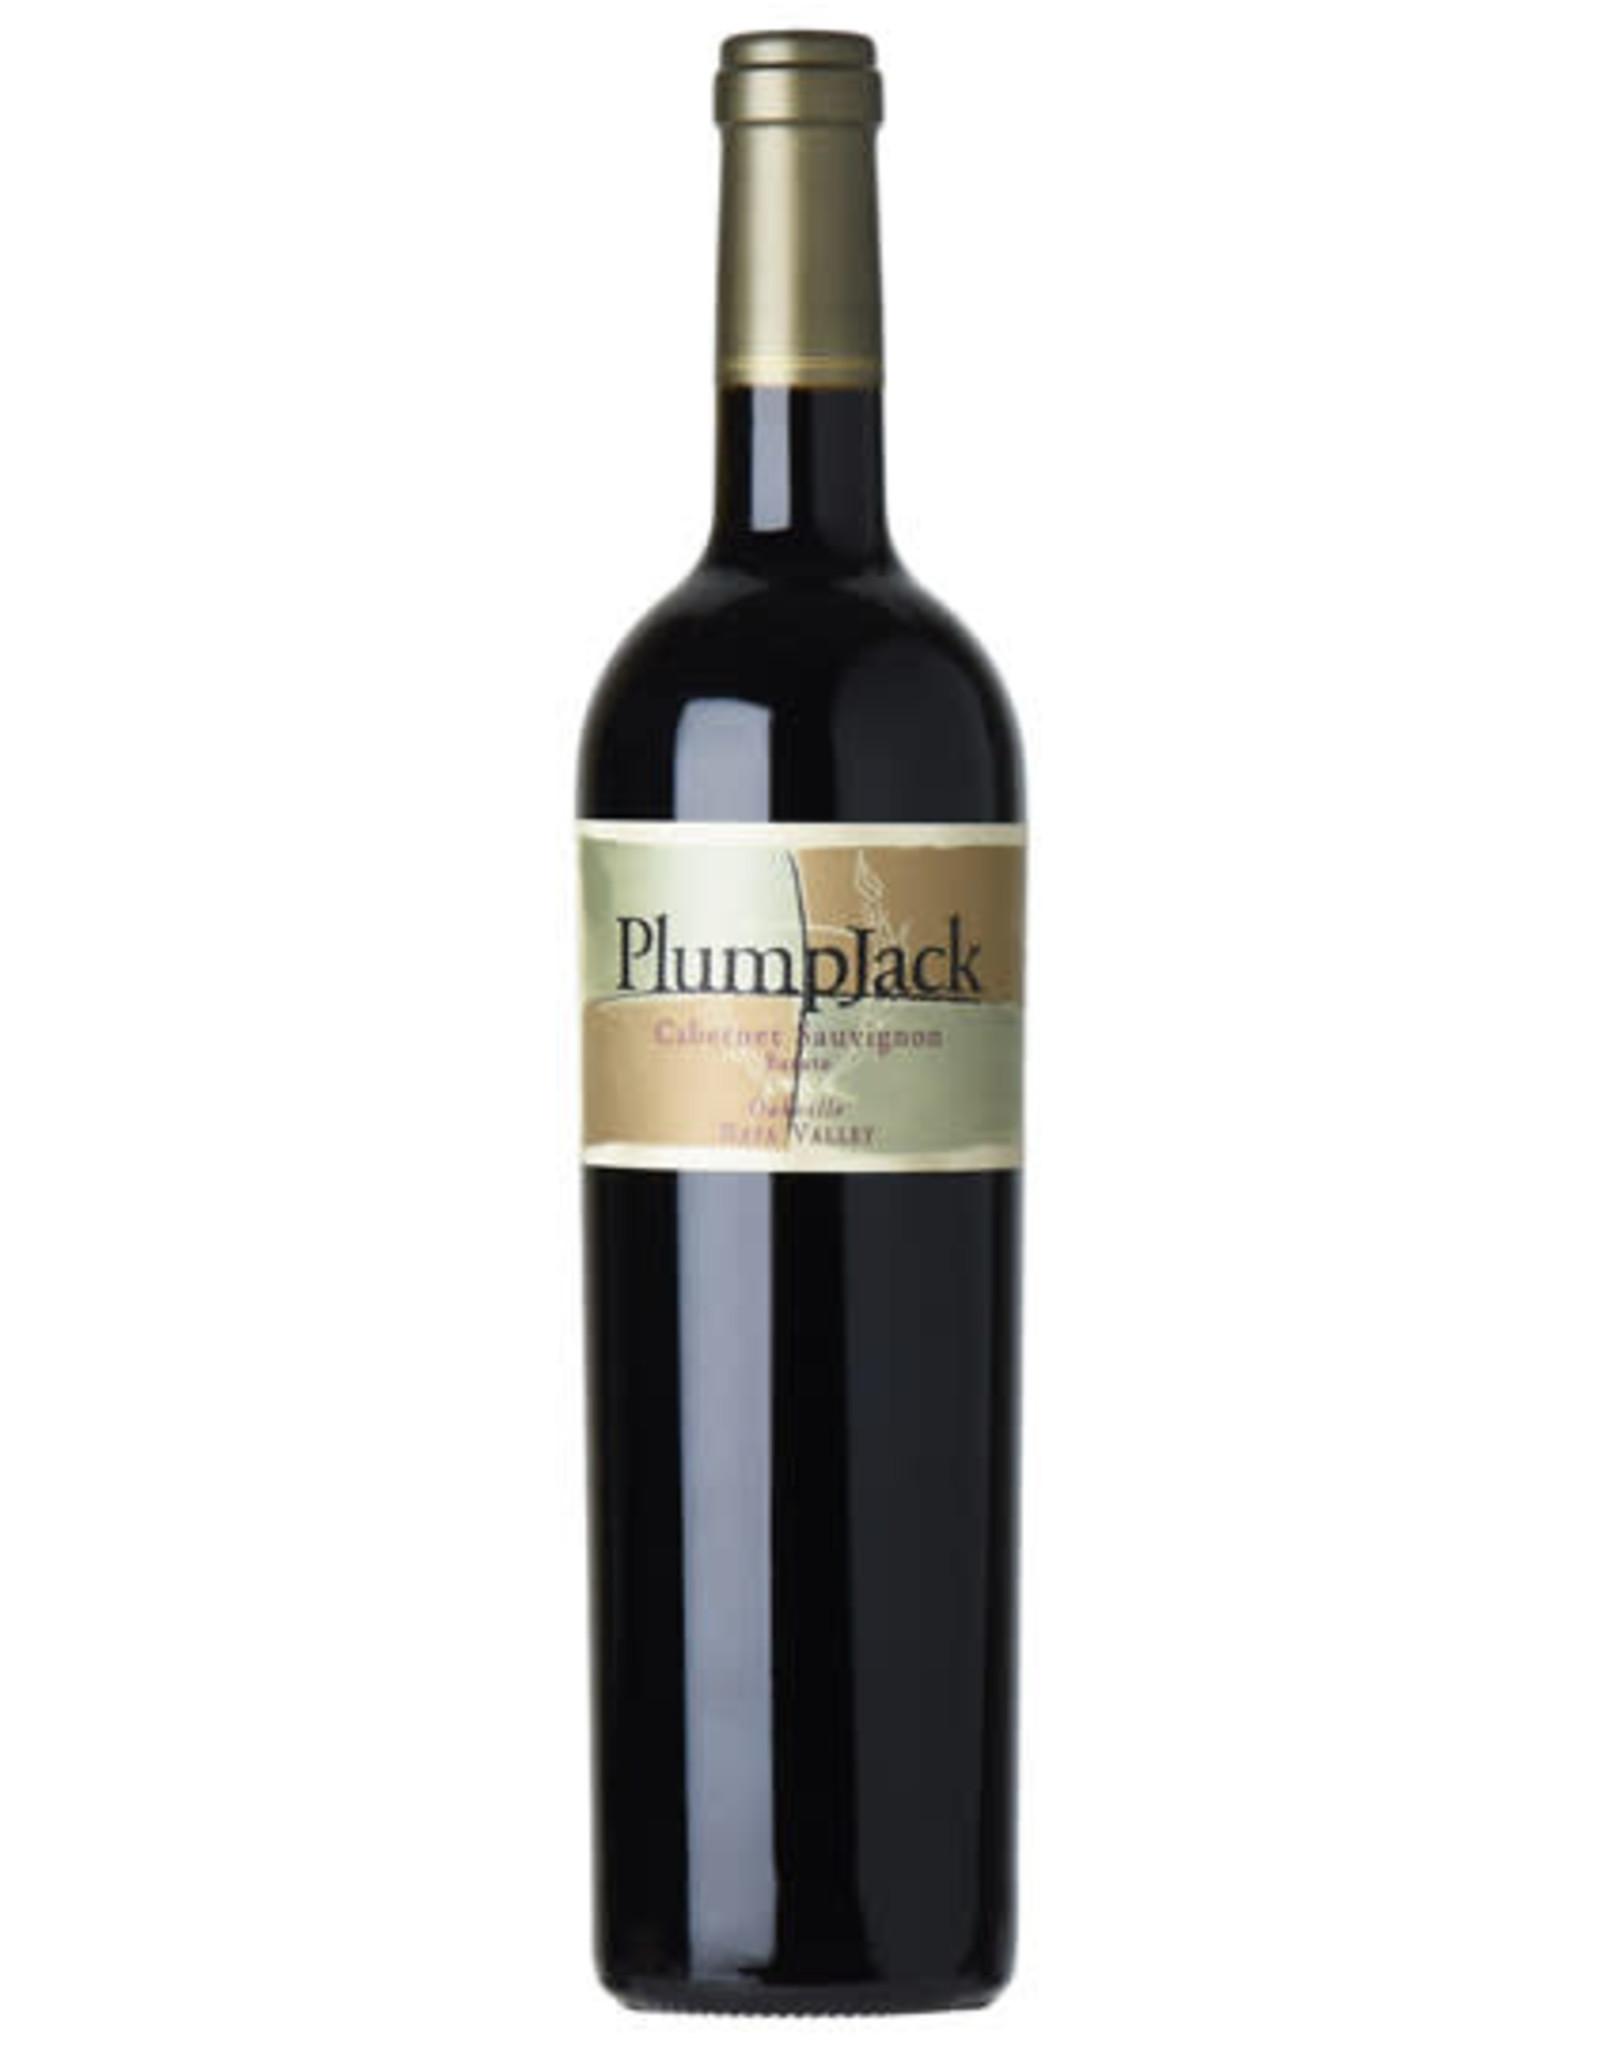 PlumpJack Cabernet Sauvignon 2018